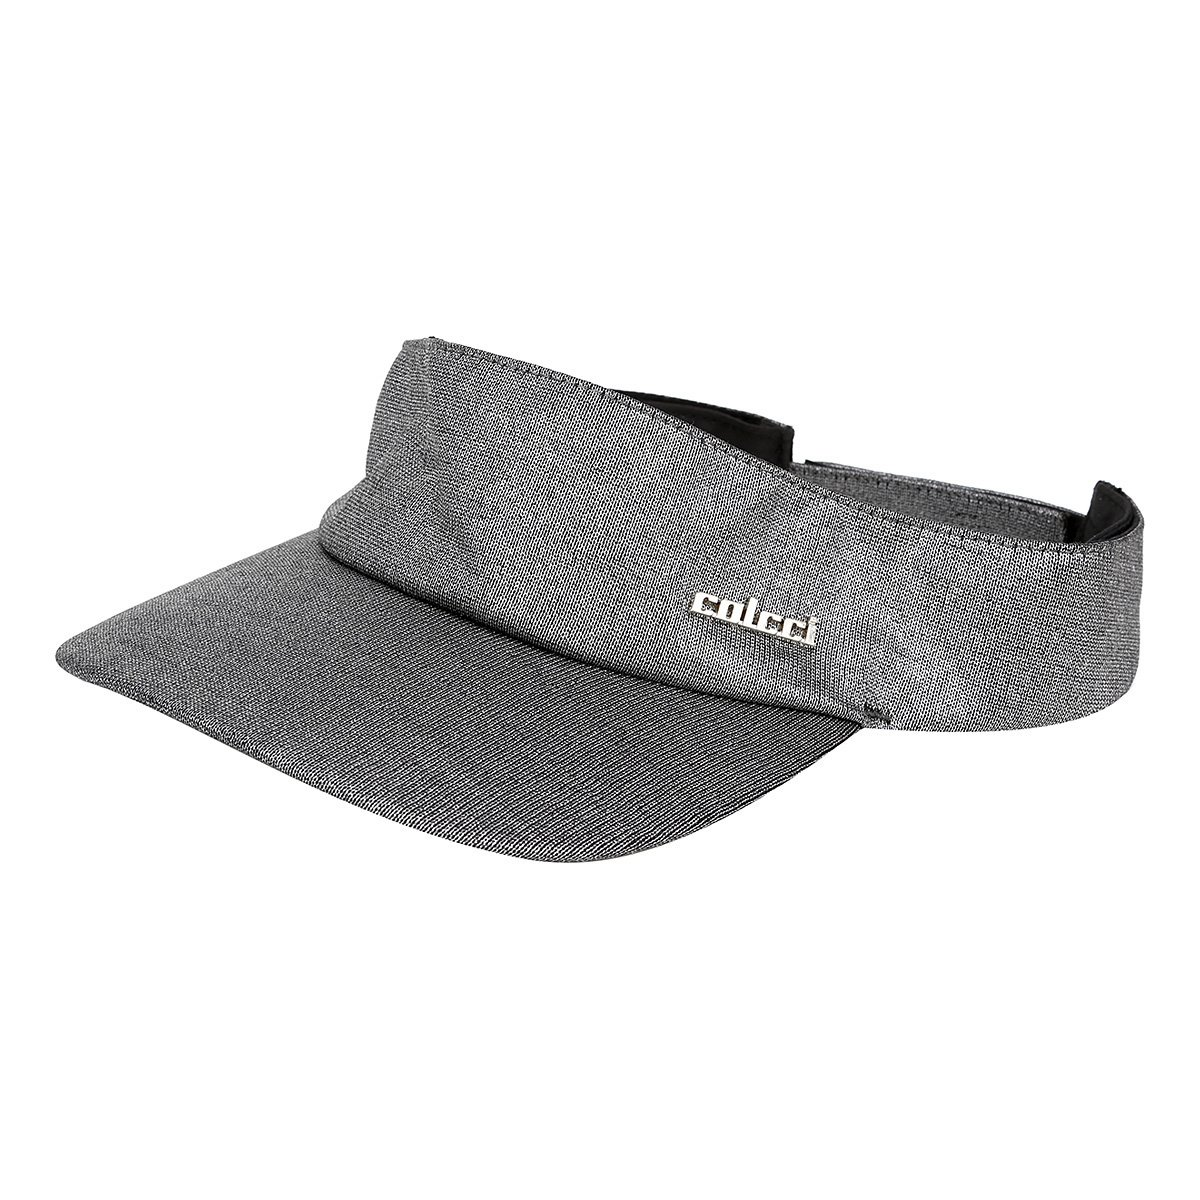 Boné Colcci Aba Curva Viseira Metalizada - Compre Agora  056f6261471